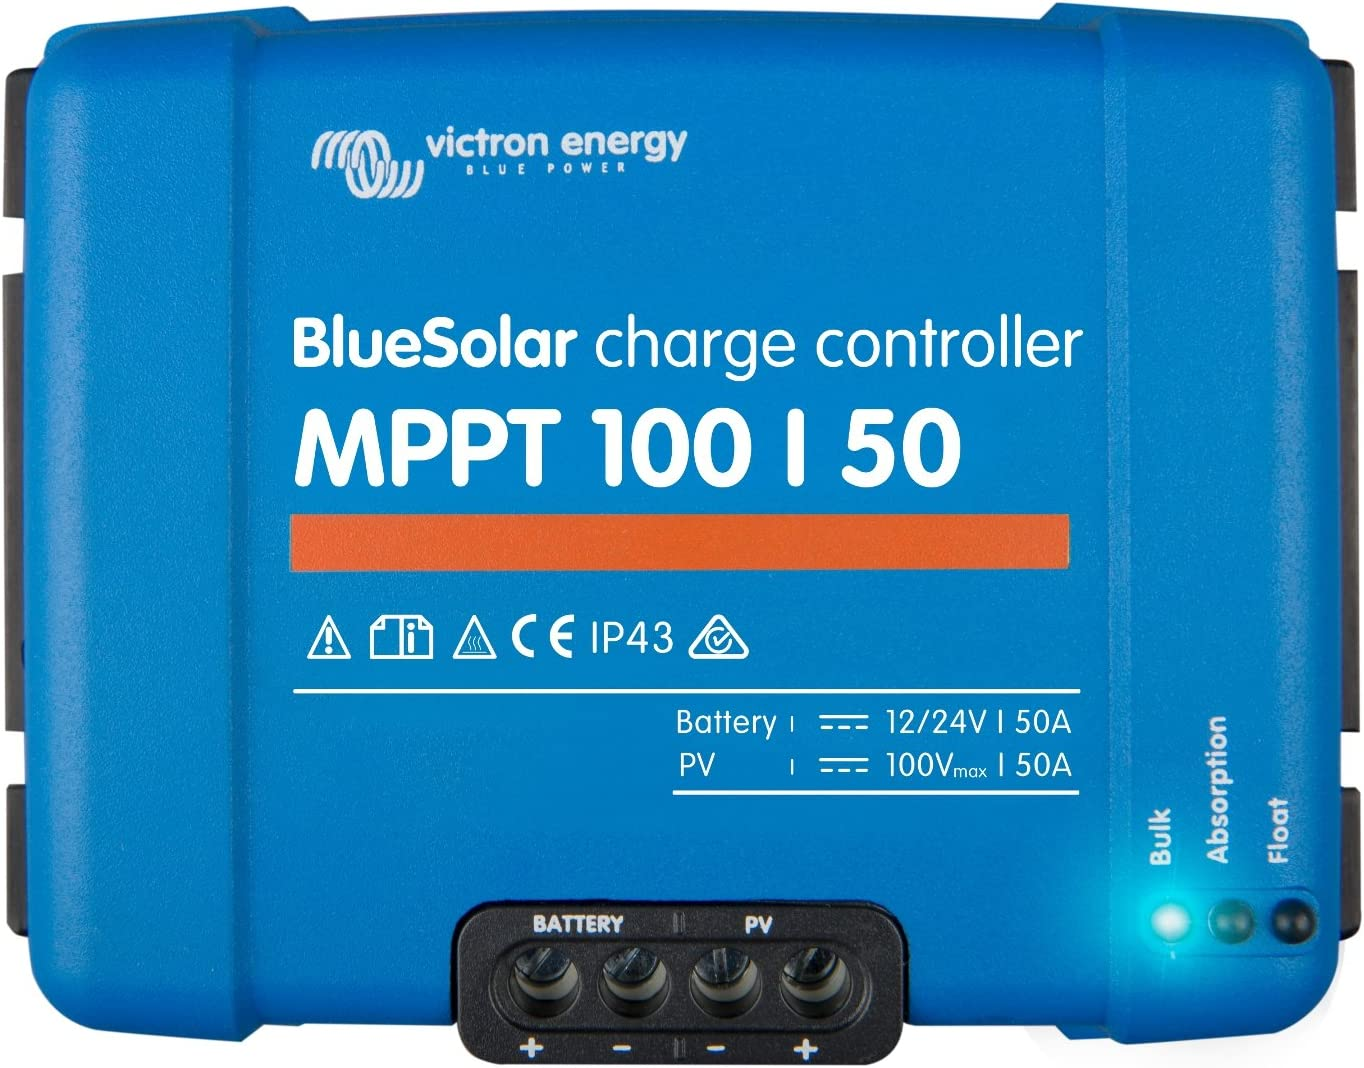 Victron BlueSolar MPPT 100/50 50A - Mando de carga solar para paneles solares de hasta 700 W (12 V) y 1400 W (24 V) hasta 100 V